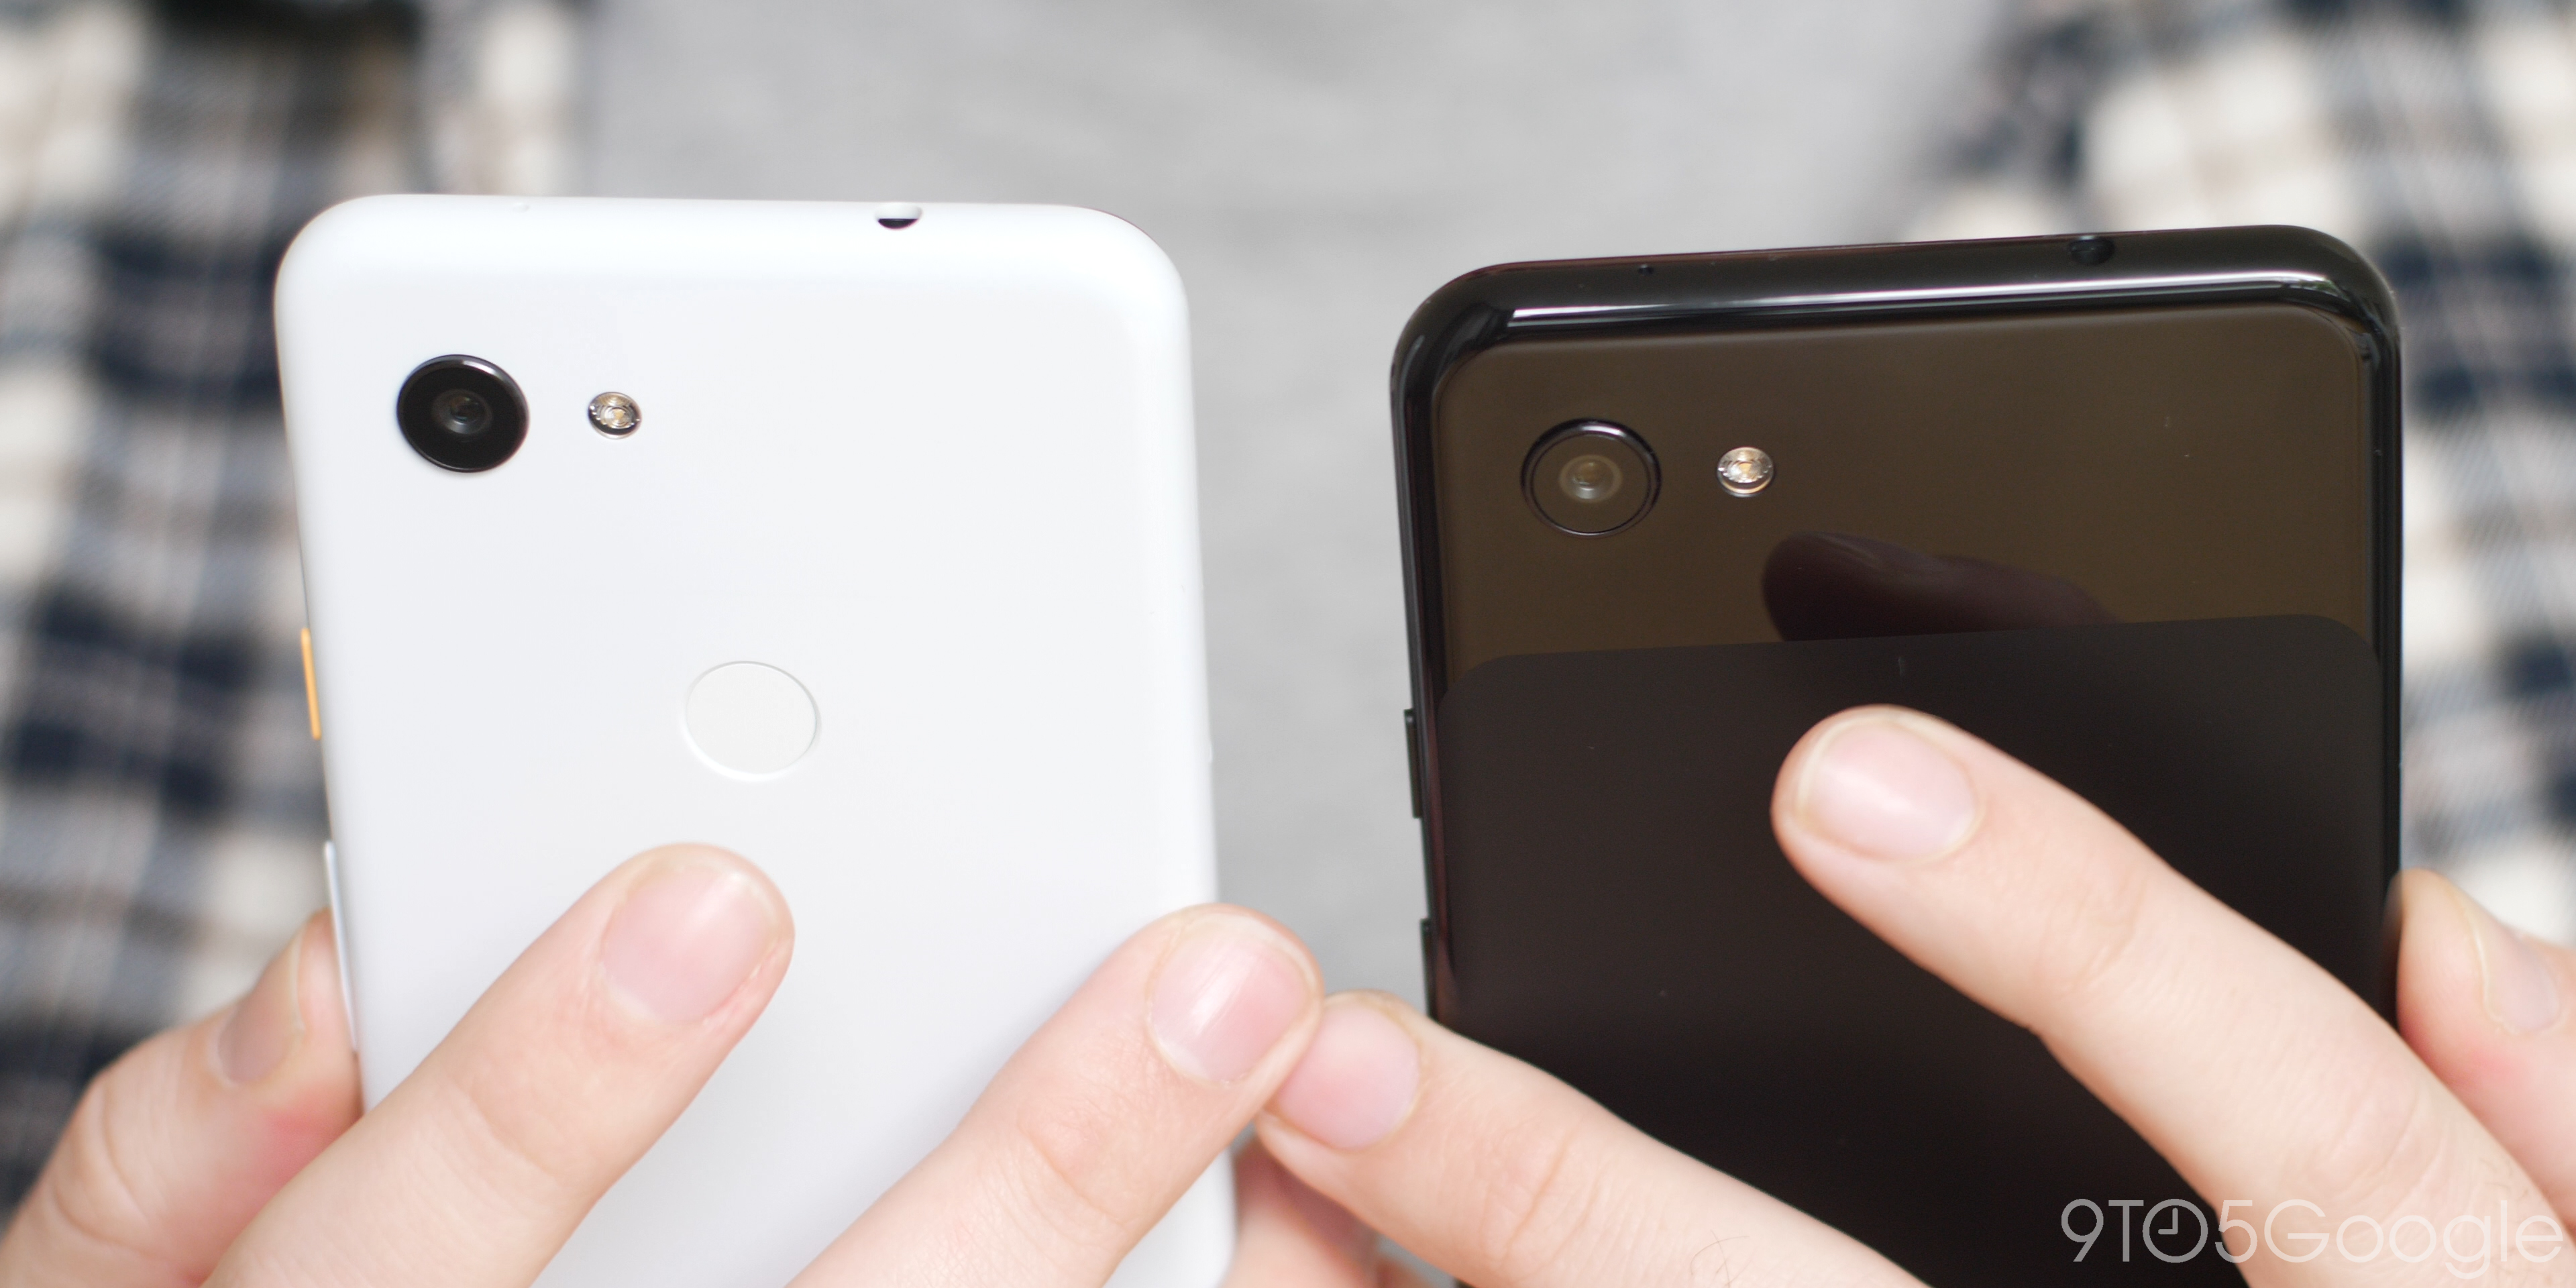 Pixel 3a, Pixel 3a XL design